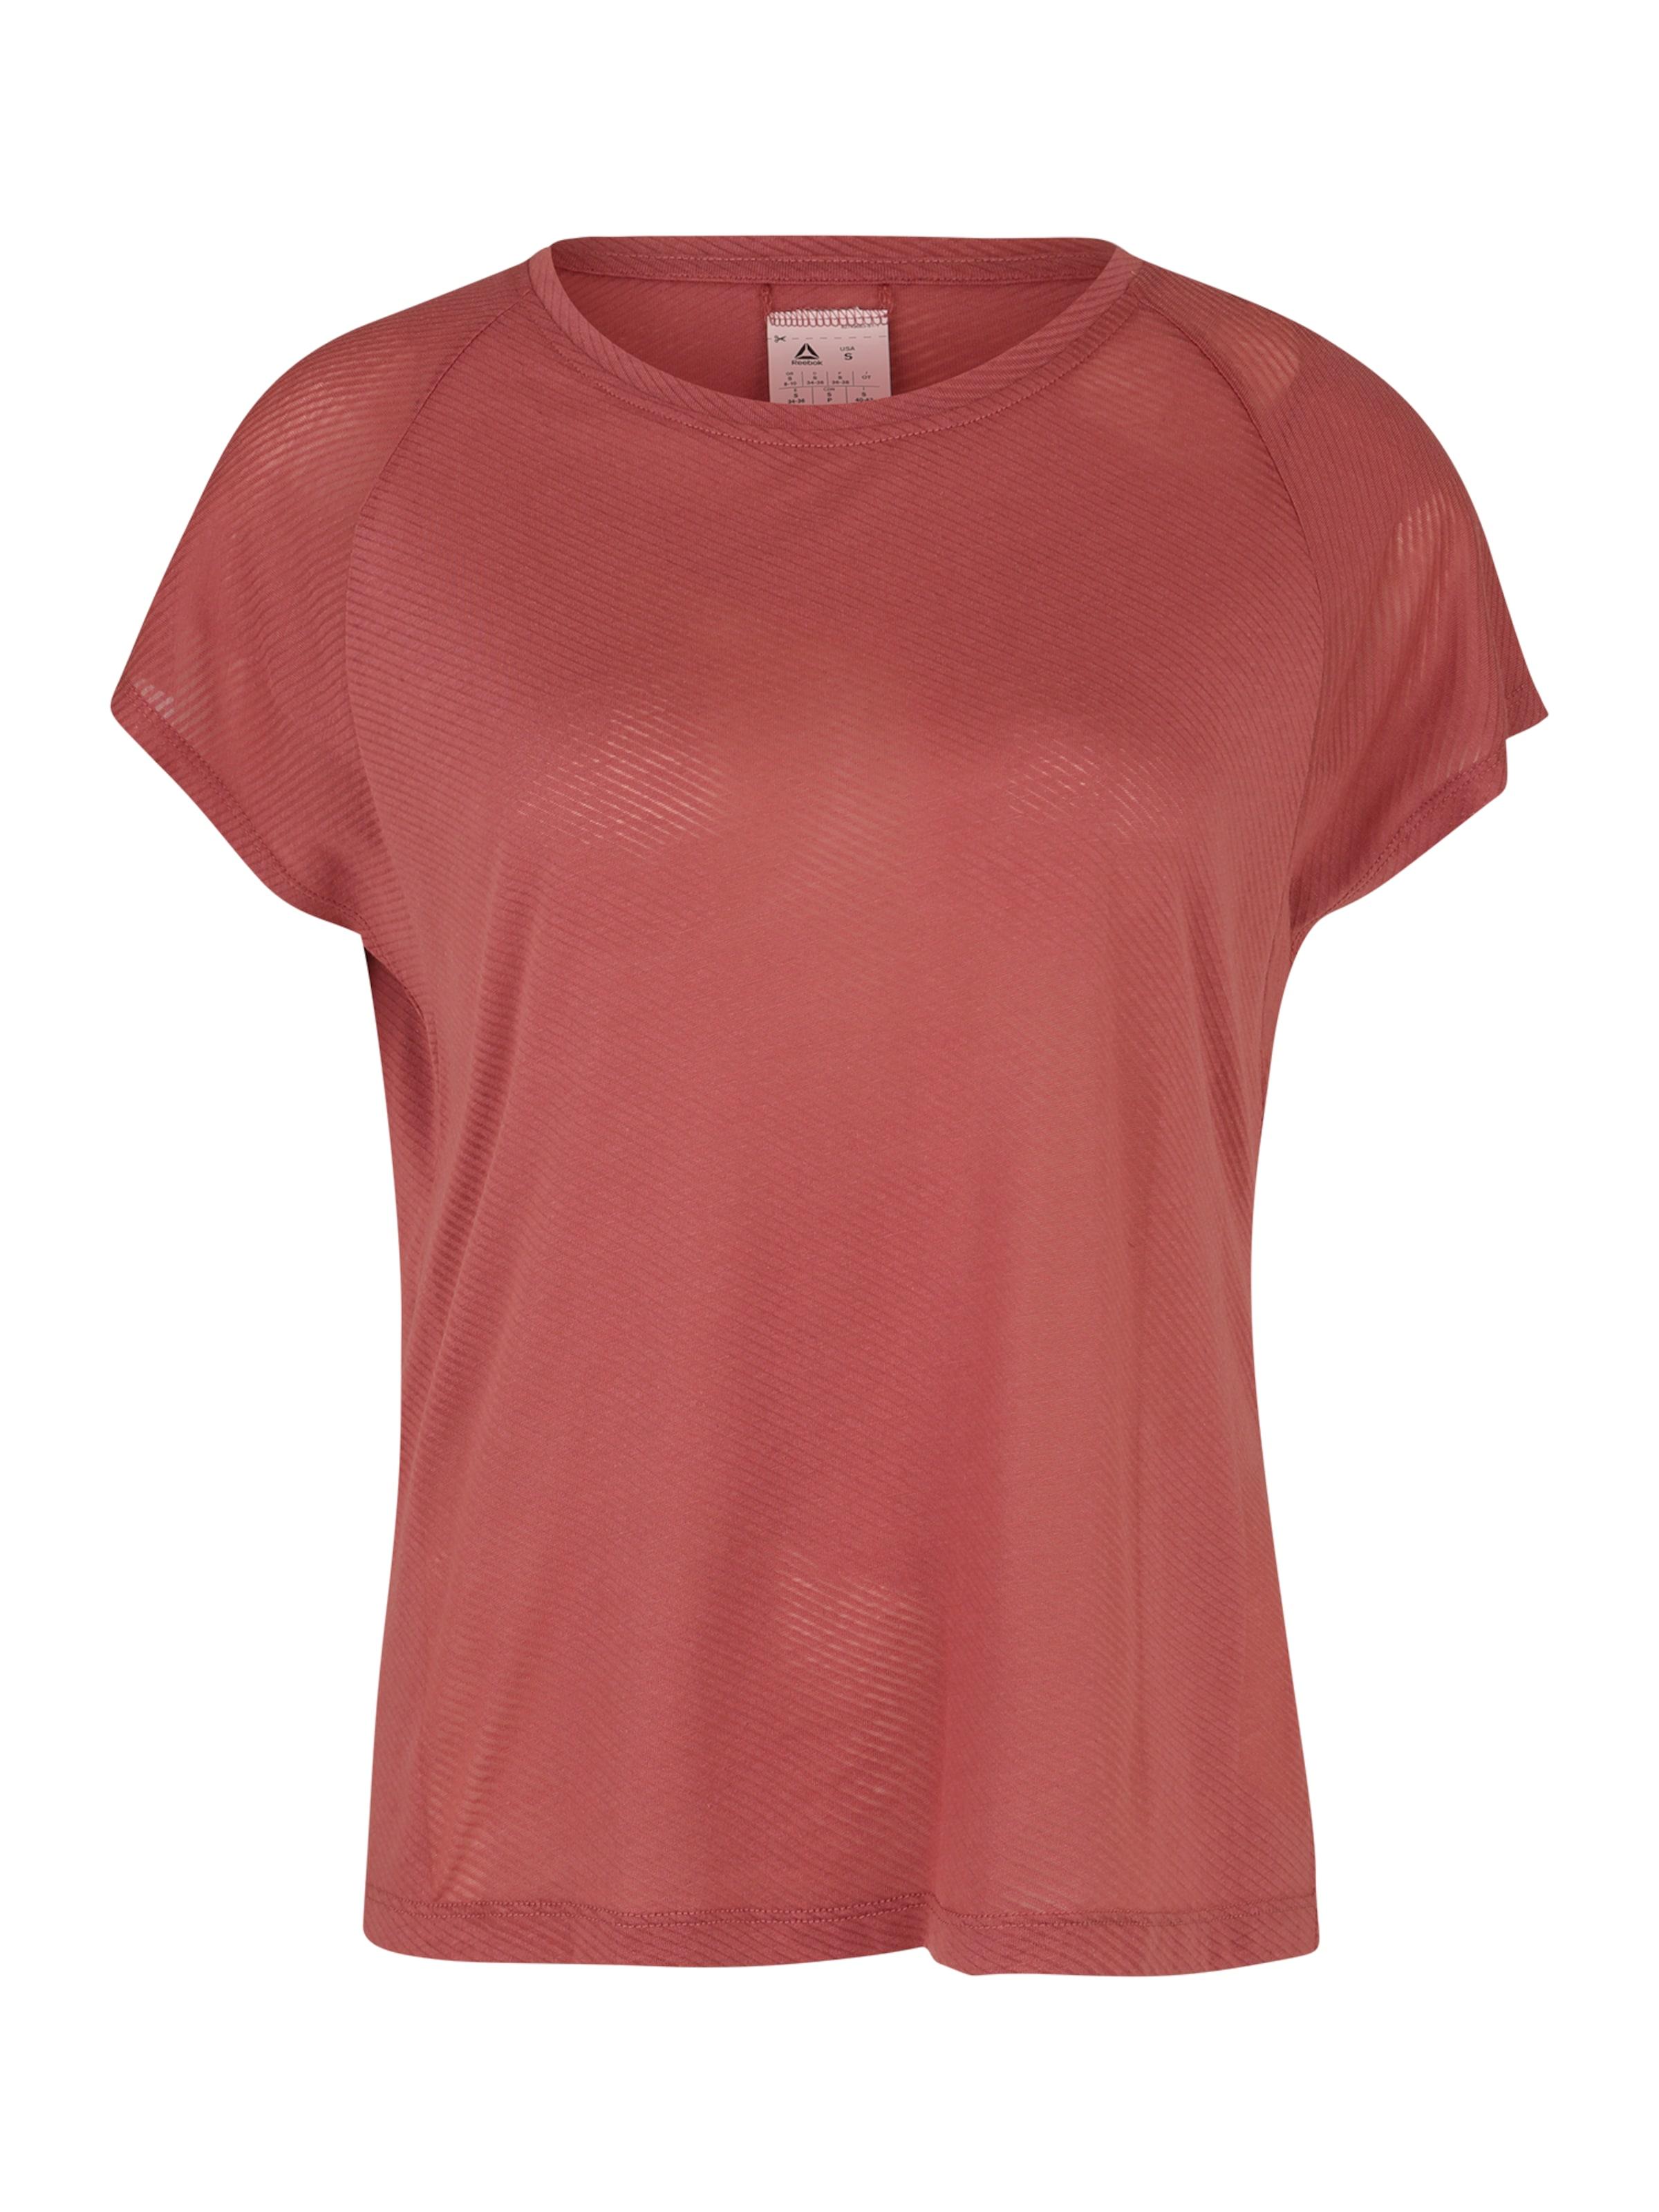 Damen Reebok Sportshirt rot | 04062049837180